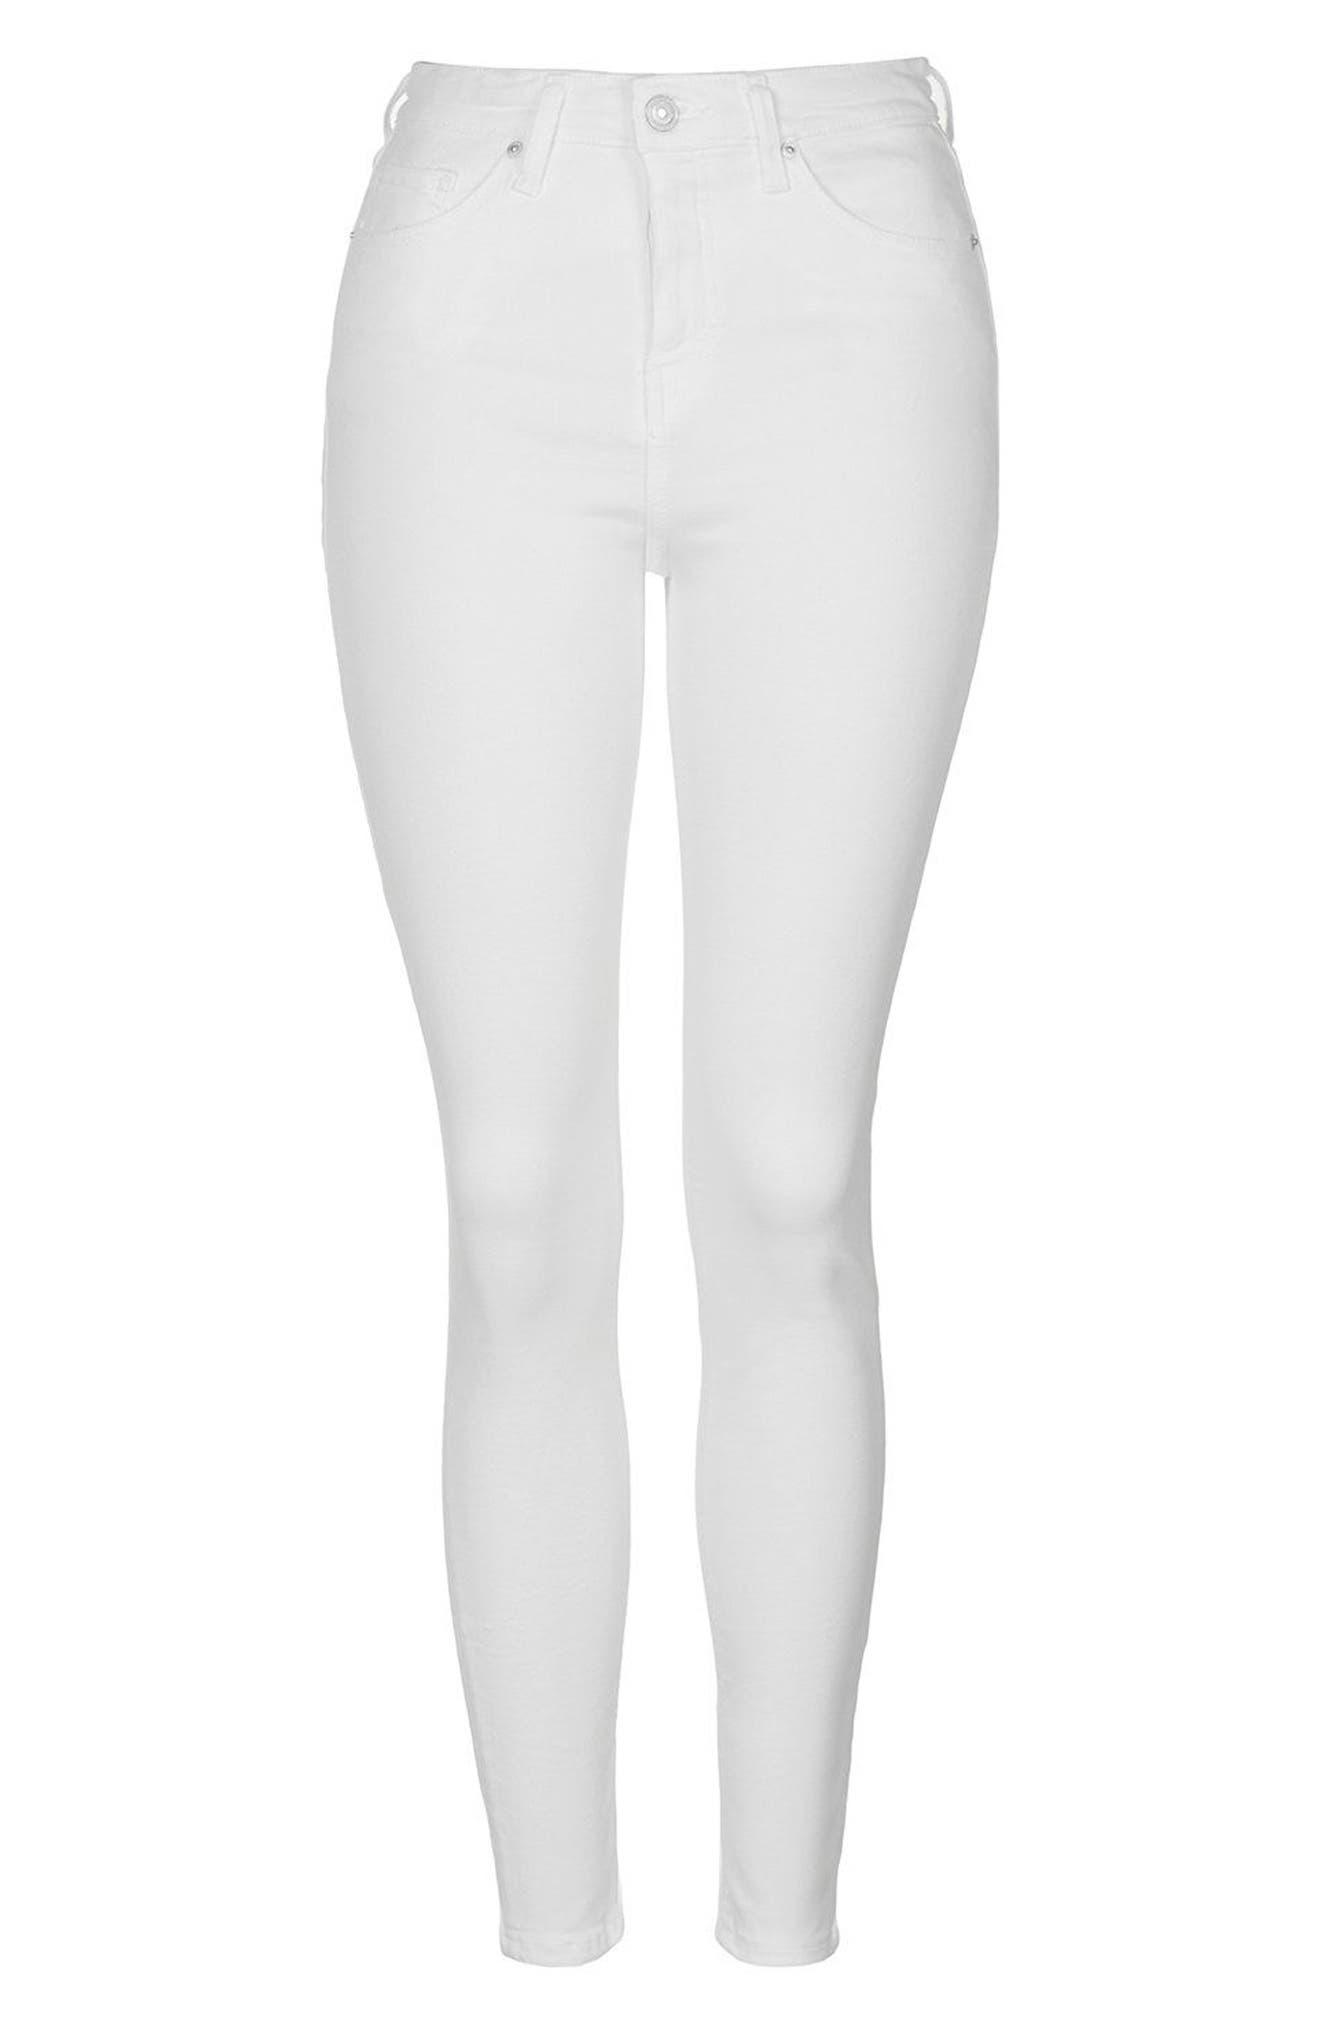 TOPSHOP, Moto Jamie Jeans, Alternate thumbnail 5, color, WHITE